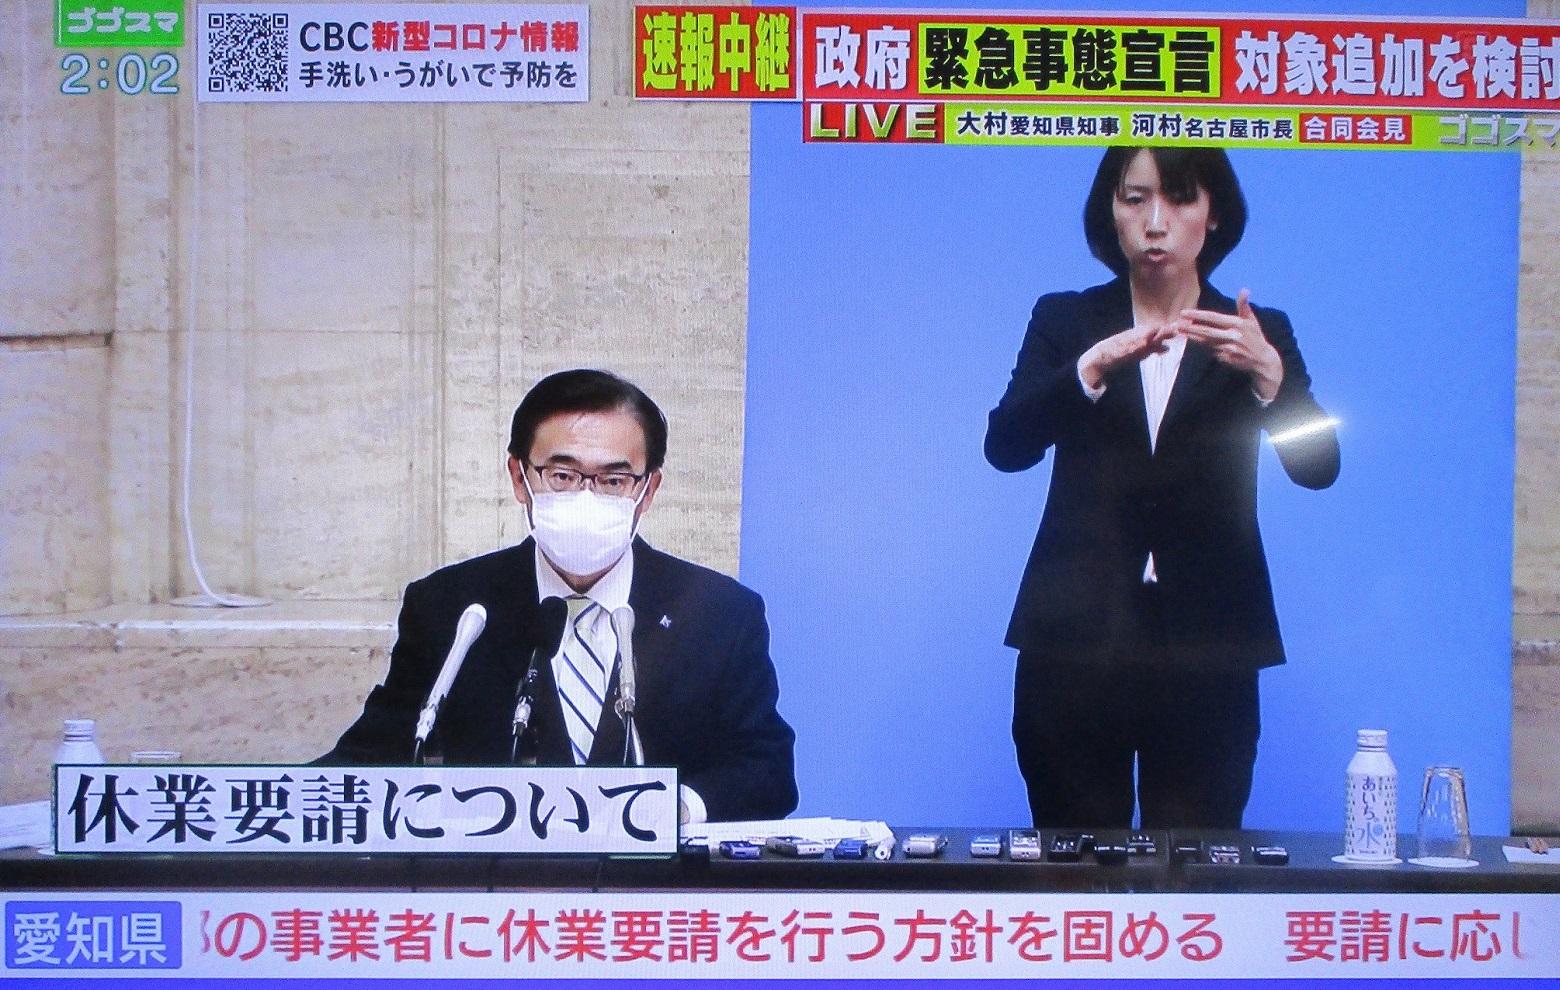 2020.4.16 CBCゴゴスマ - 大村秀章知事 (4) 1560-990